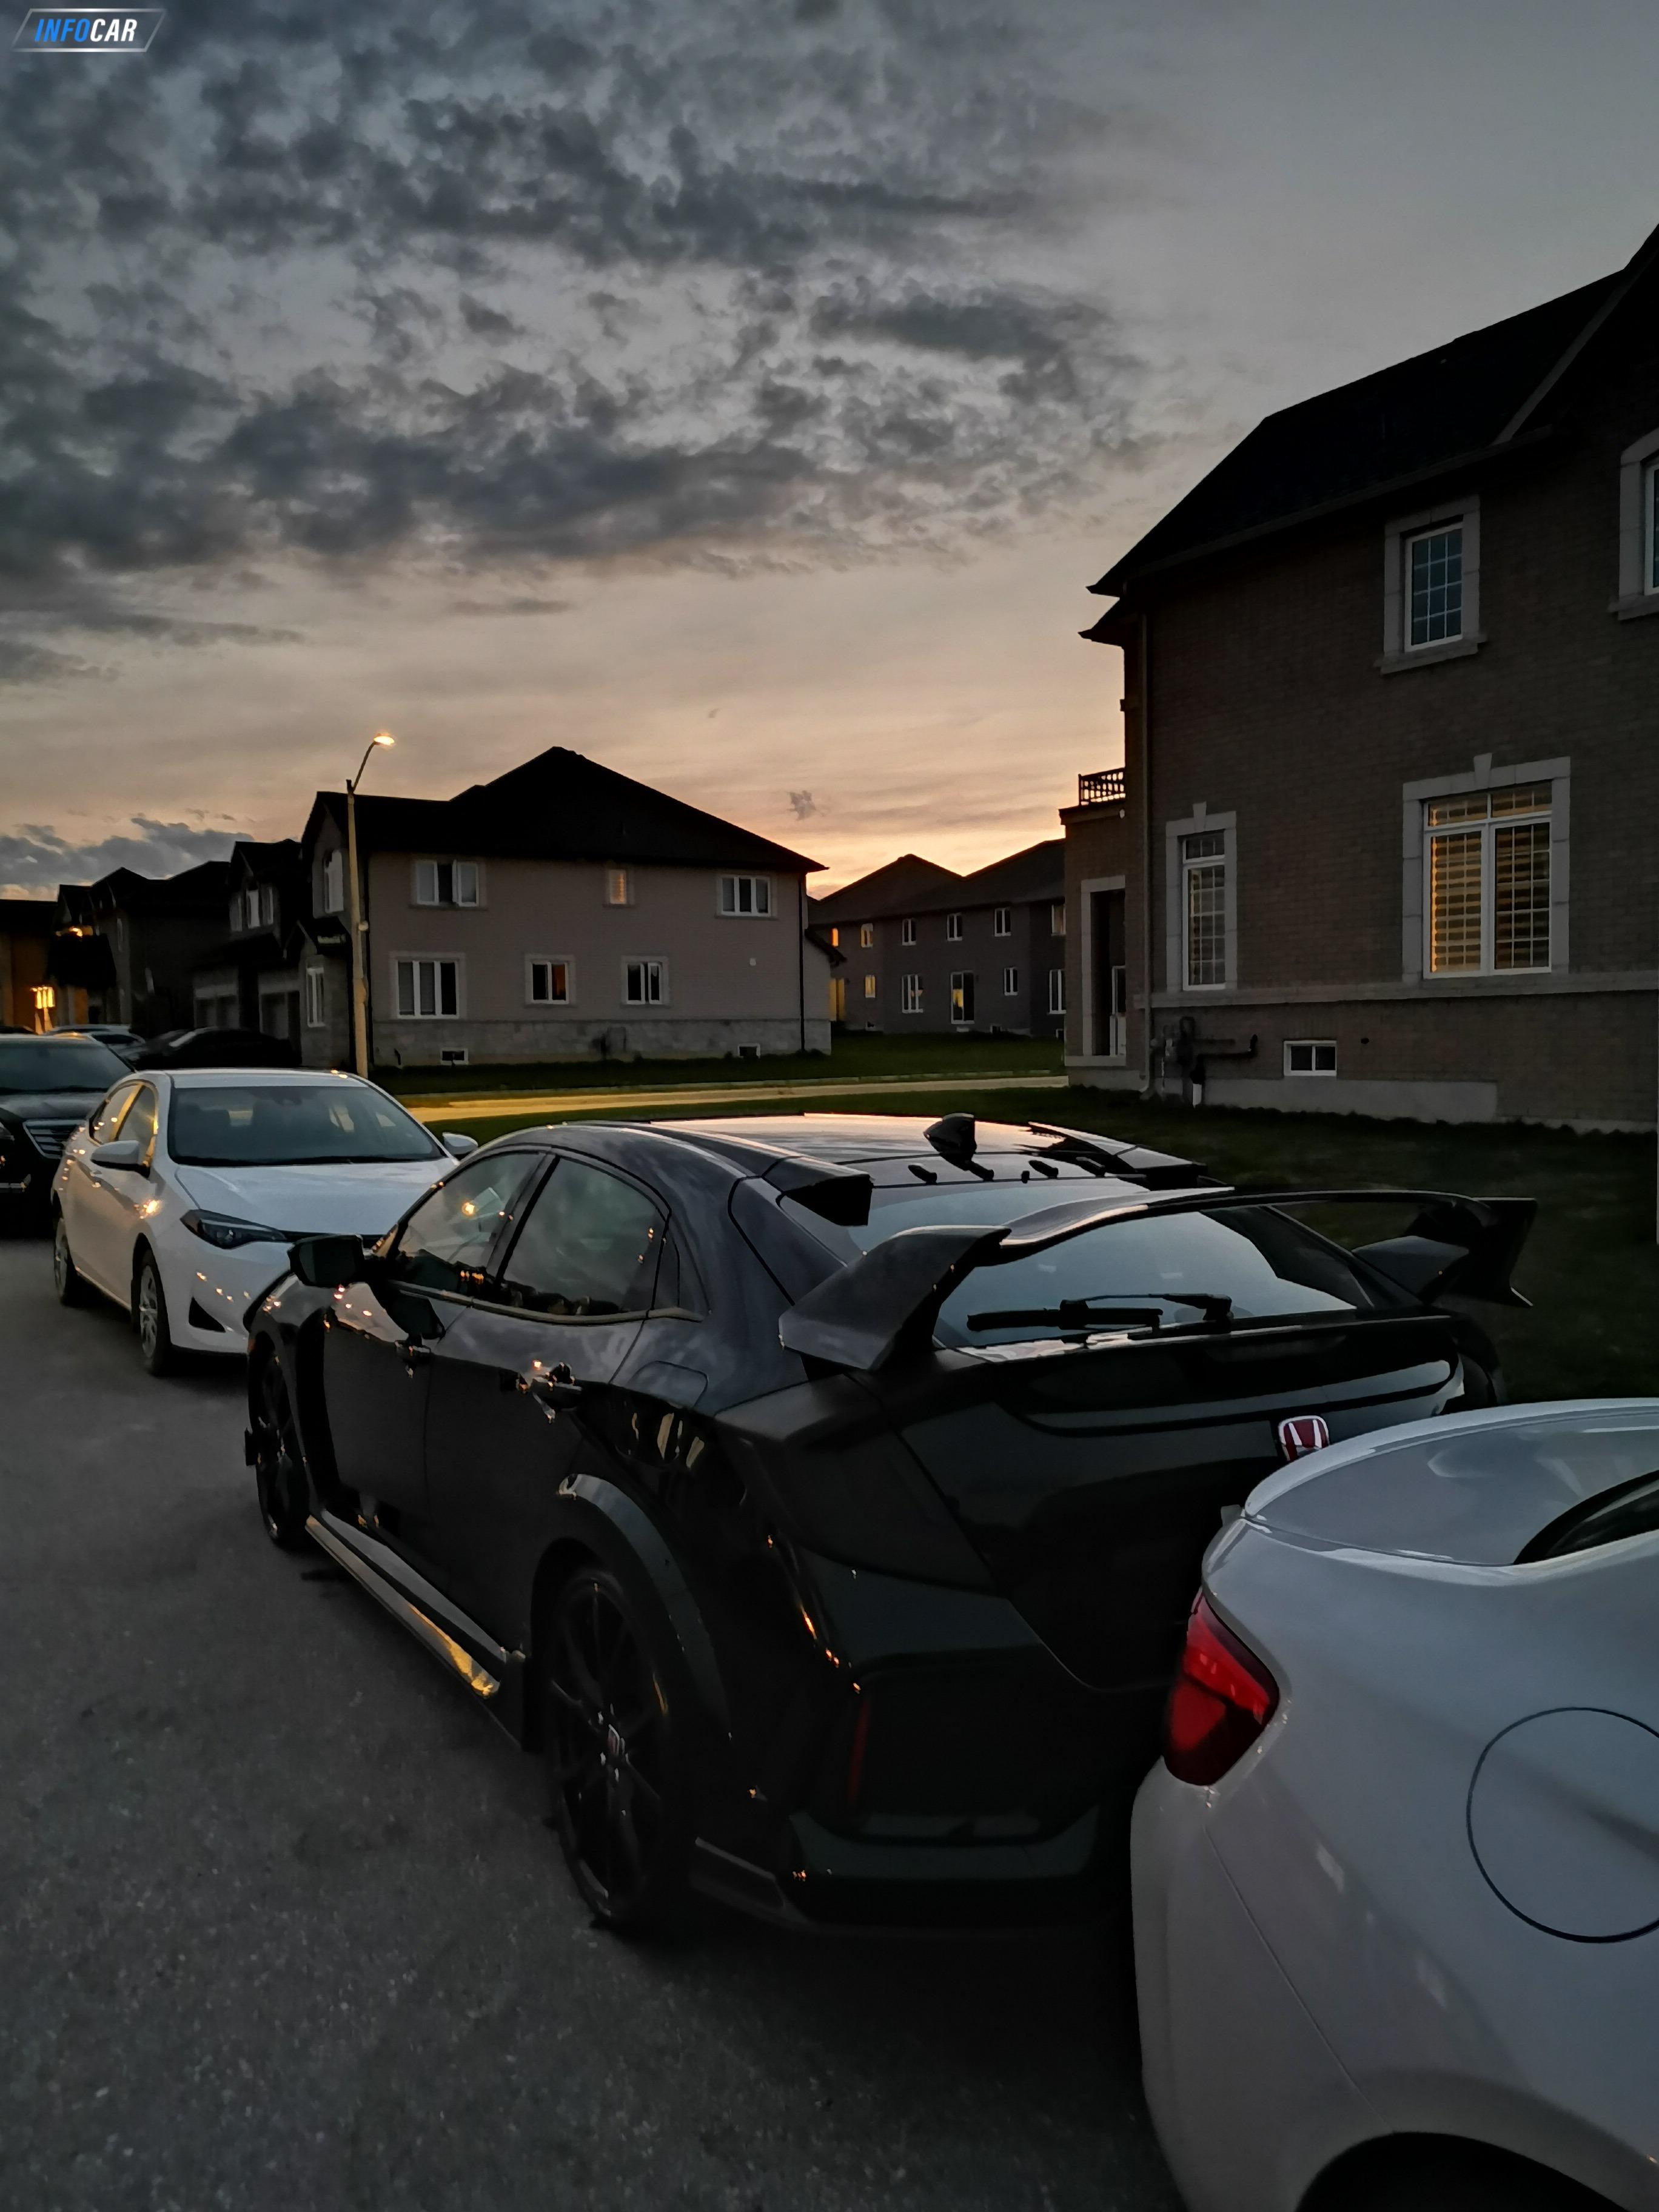 2019 Honda Civic type r - INFOCAR - Toronto's Most Comprehensive New and Used Auto Trading Platform